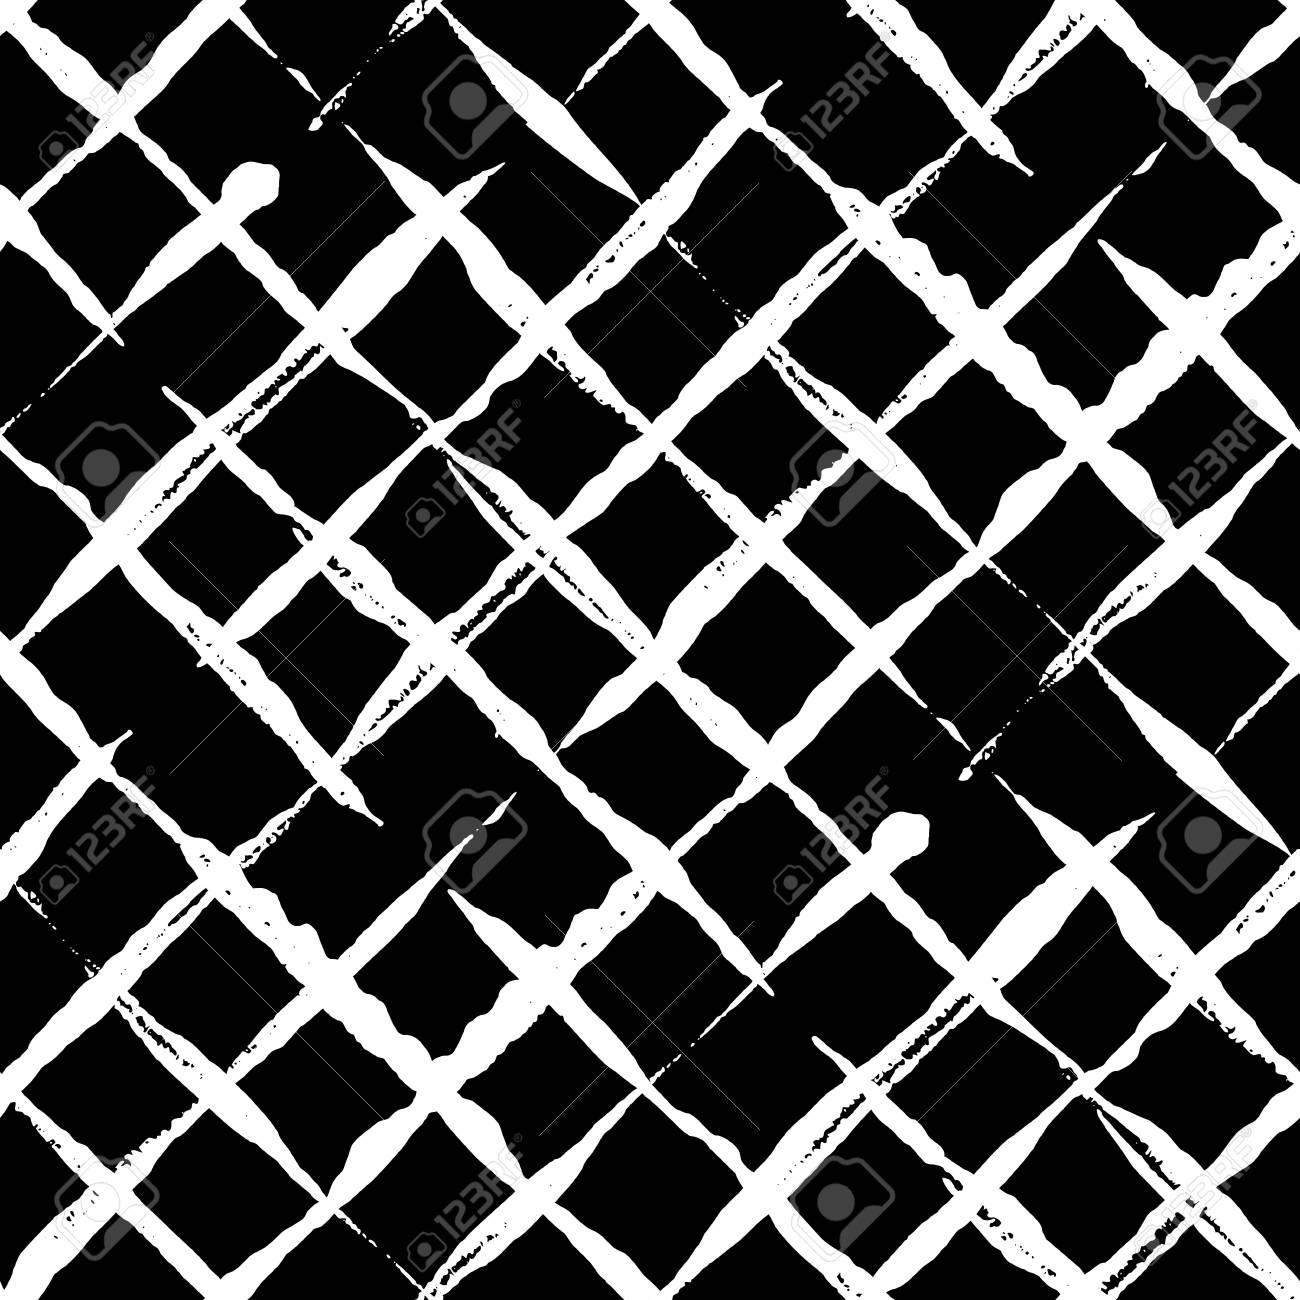 Trendy handdrawn checkered seamless pattern. - 104707896